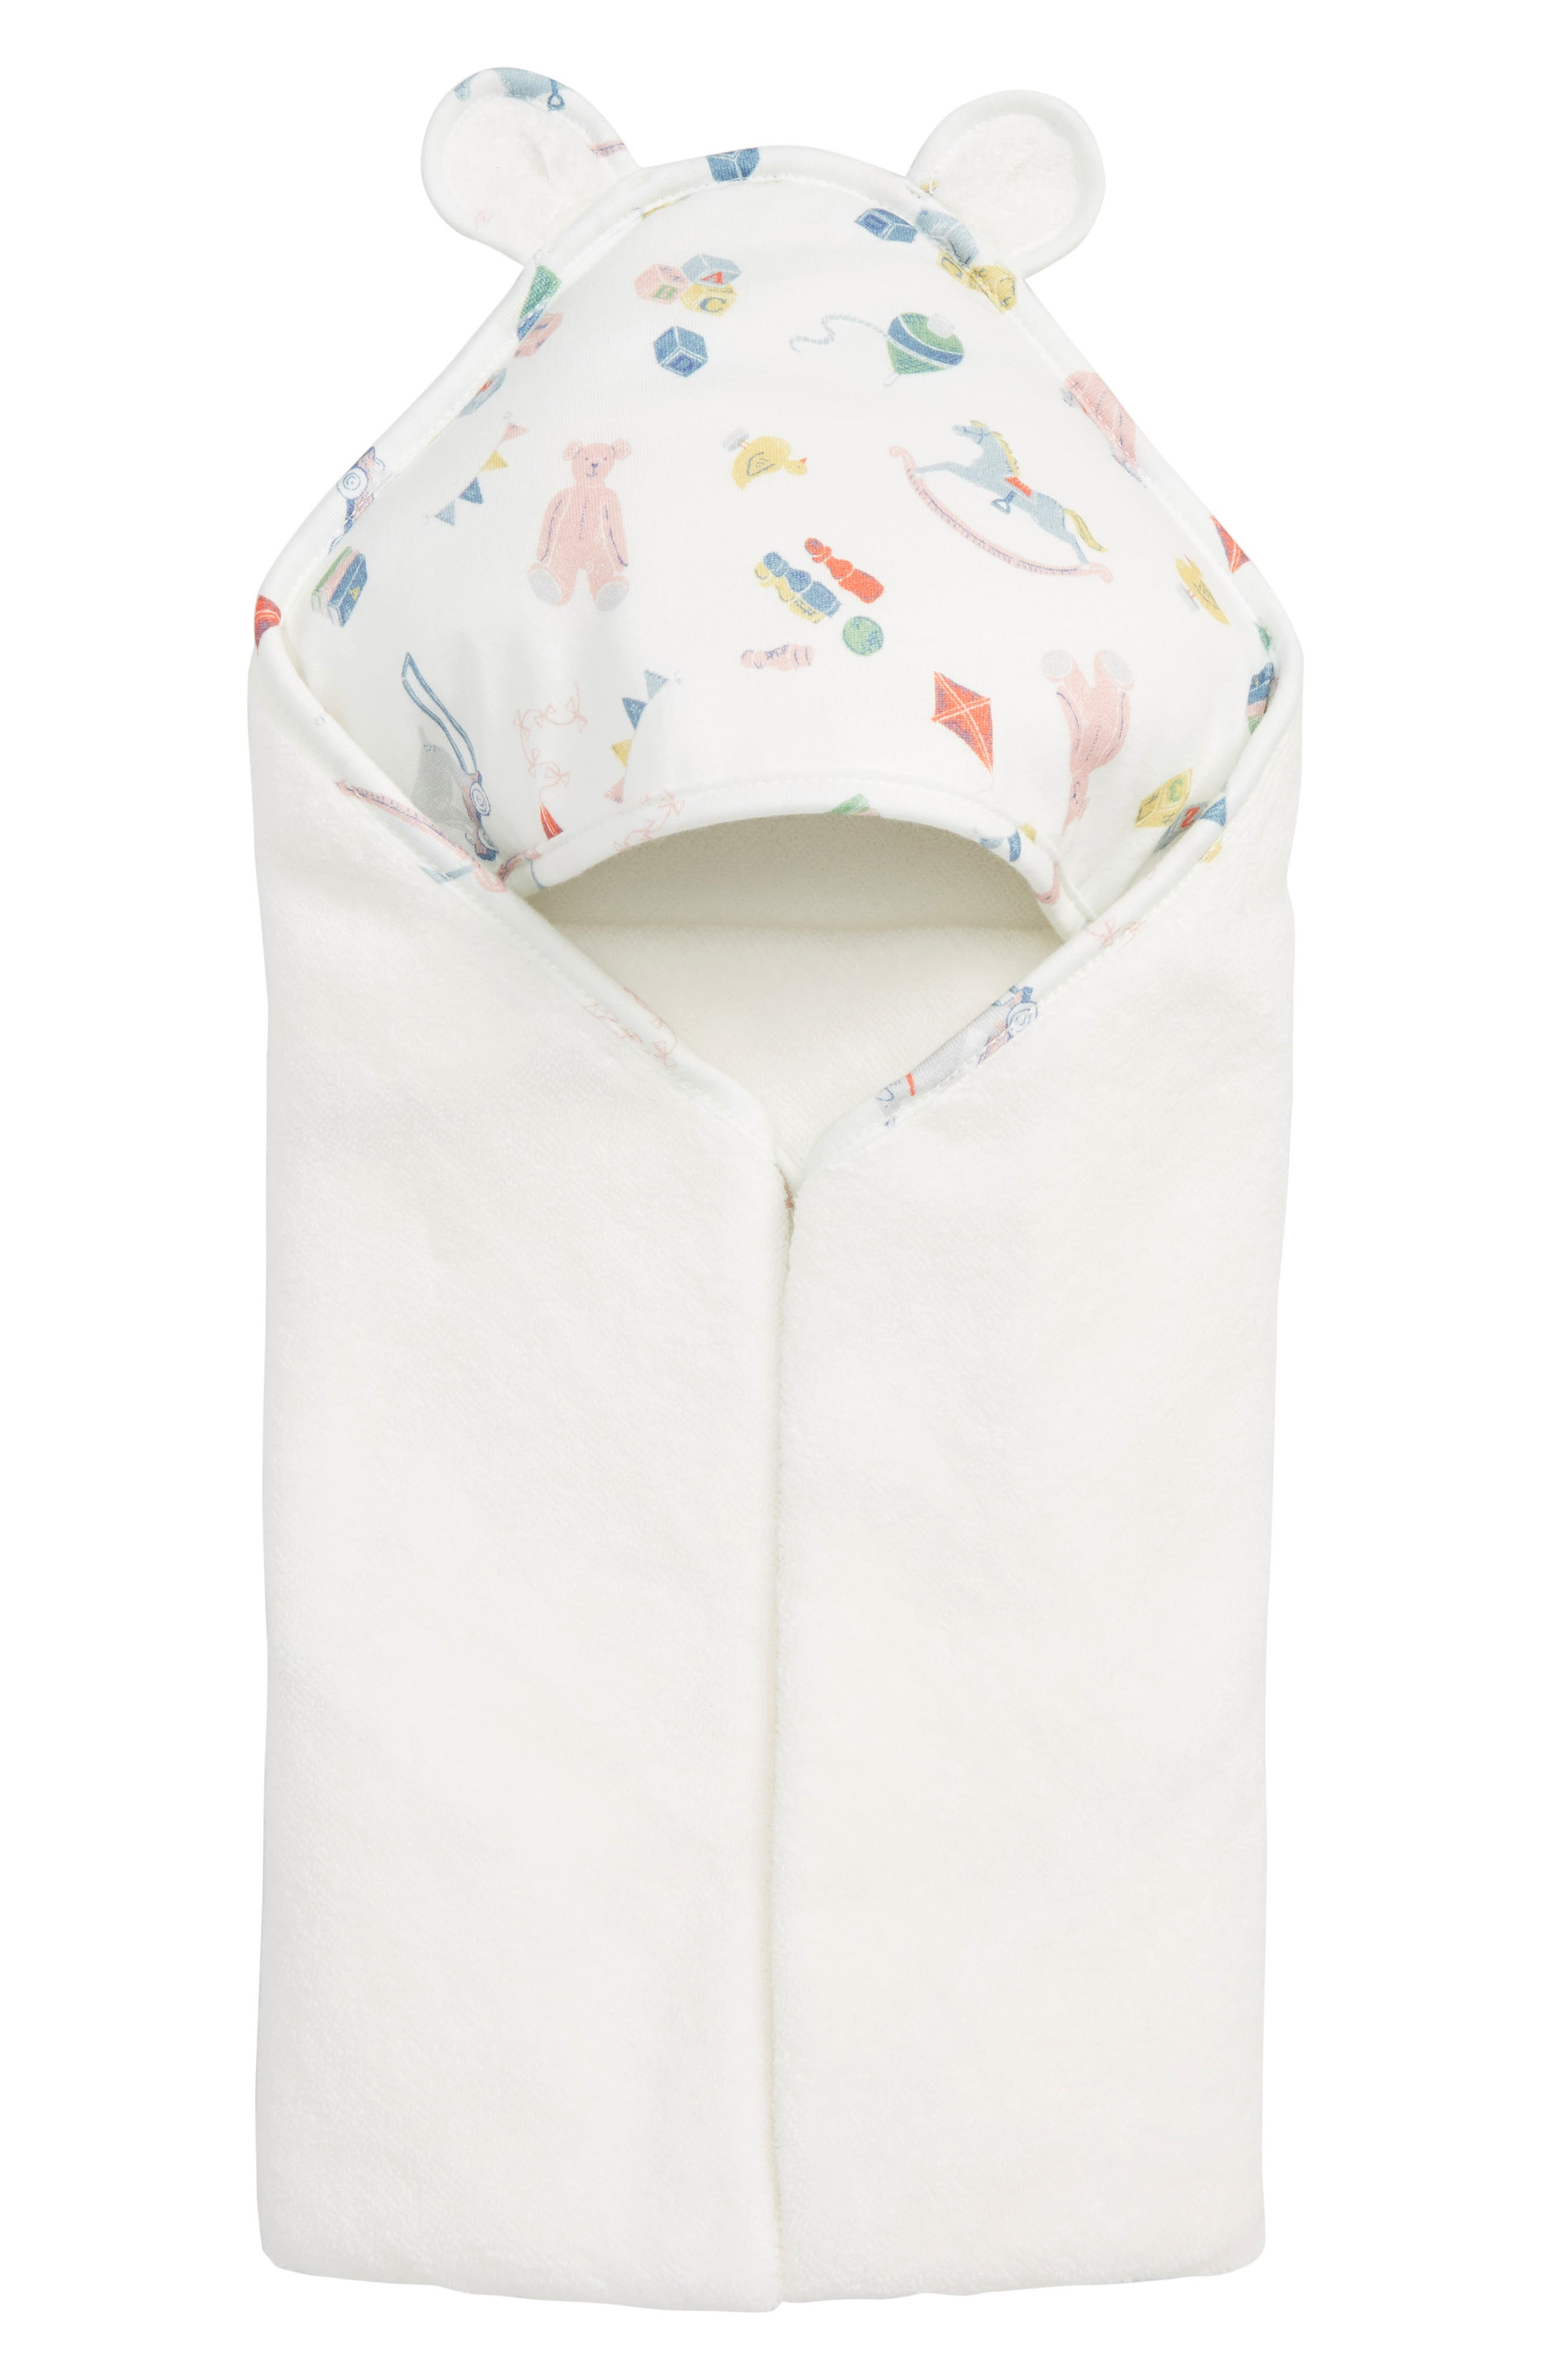 Supersoft Hooded Towel,                         Main,                         color, MULTI NURSERY